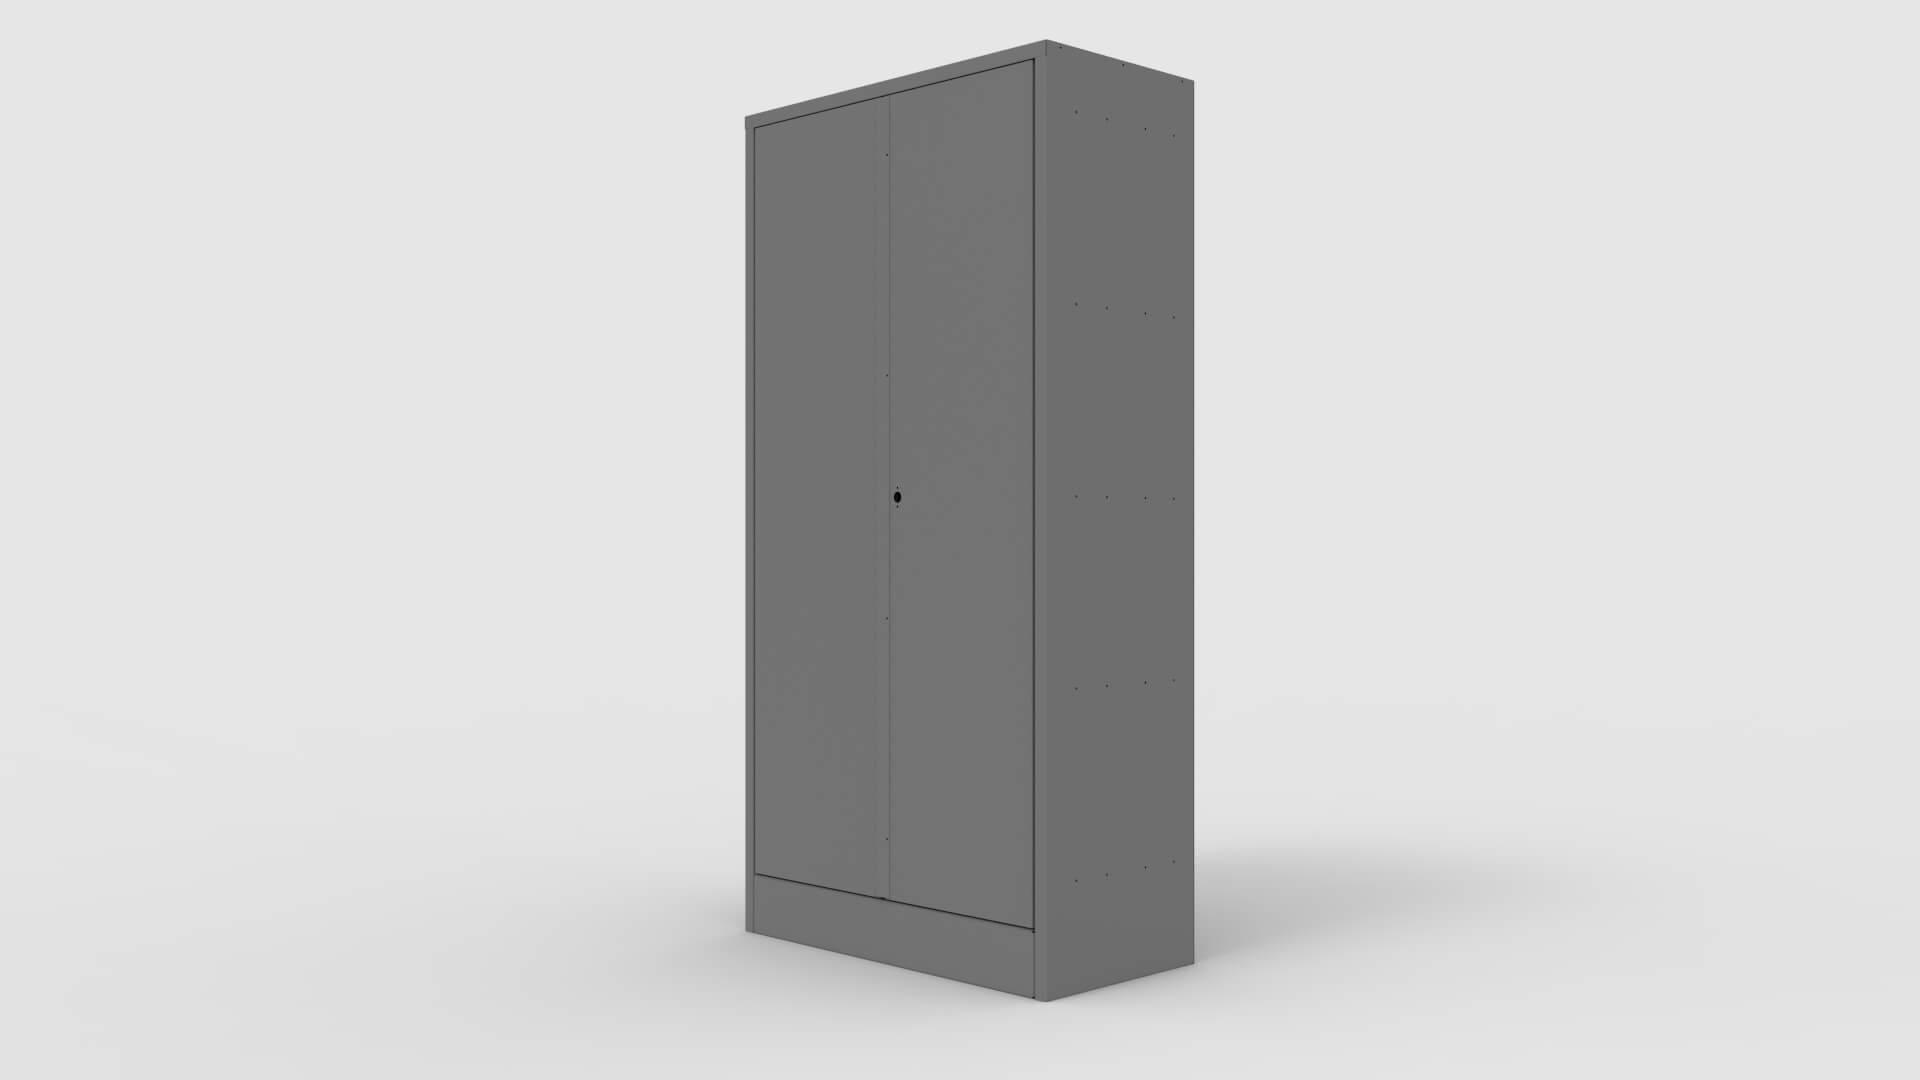 steel-cupboard-product.jpg